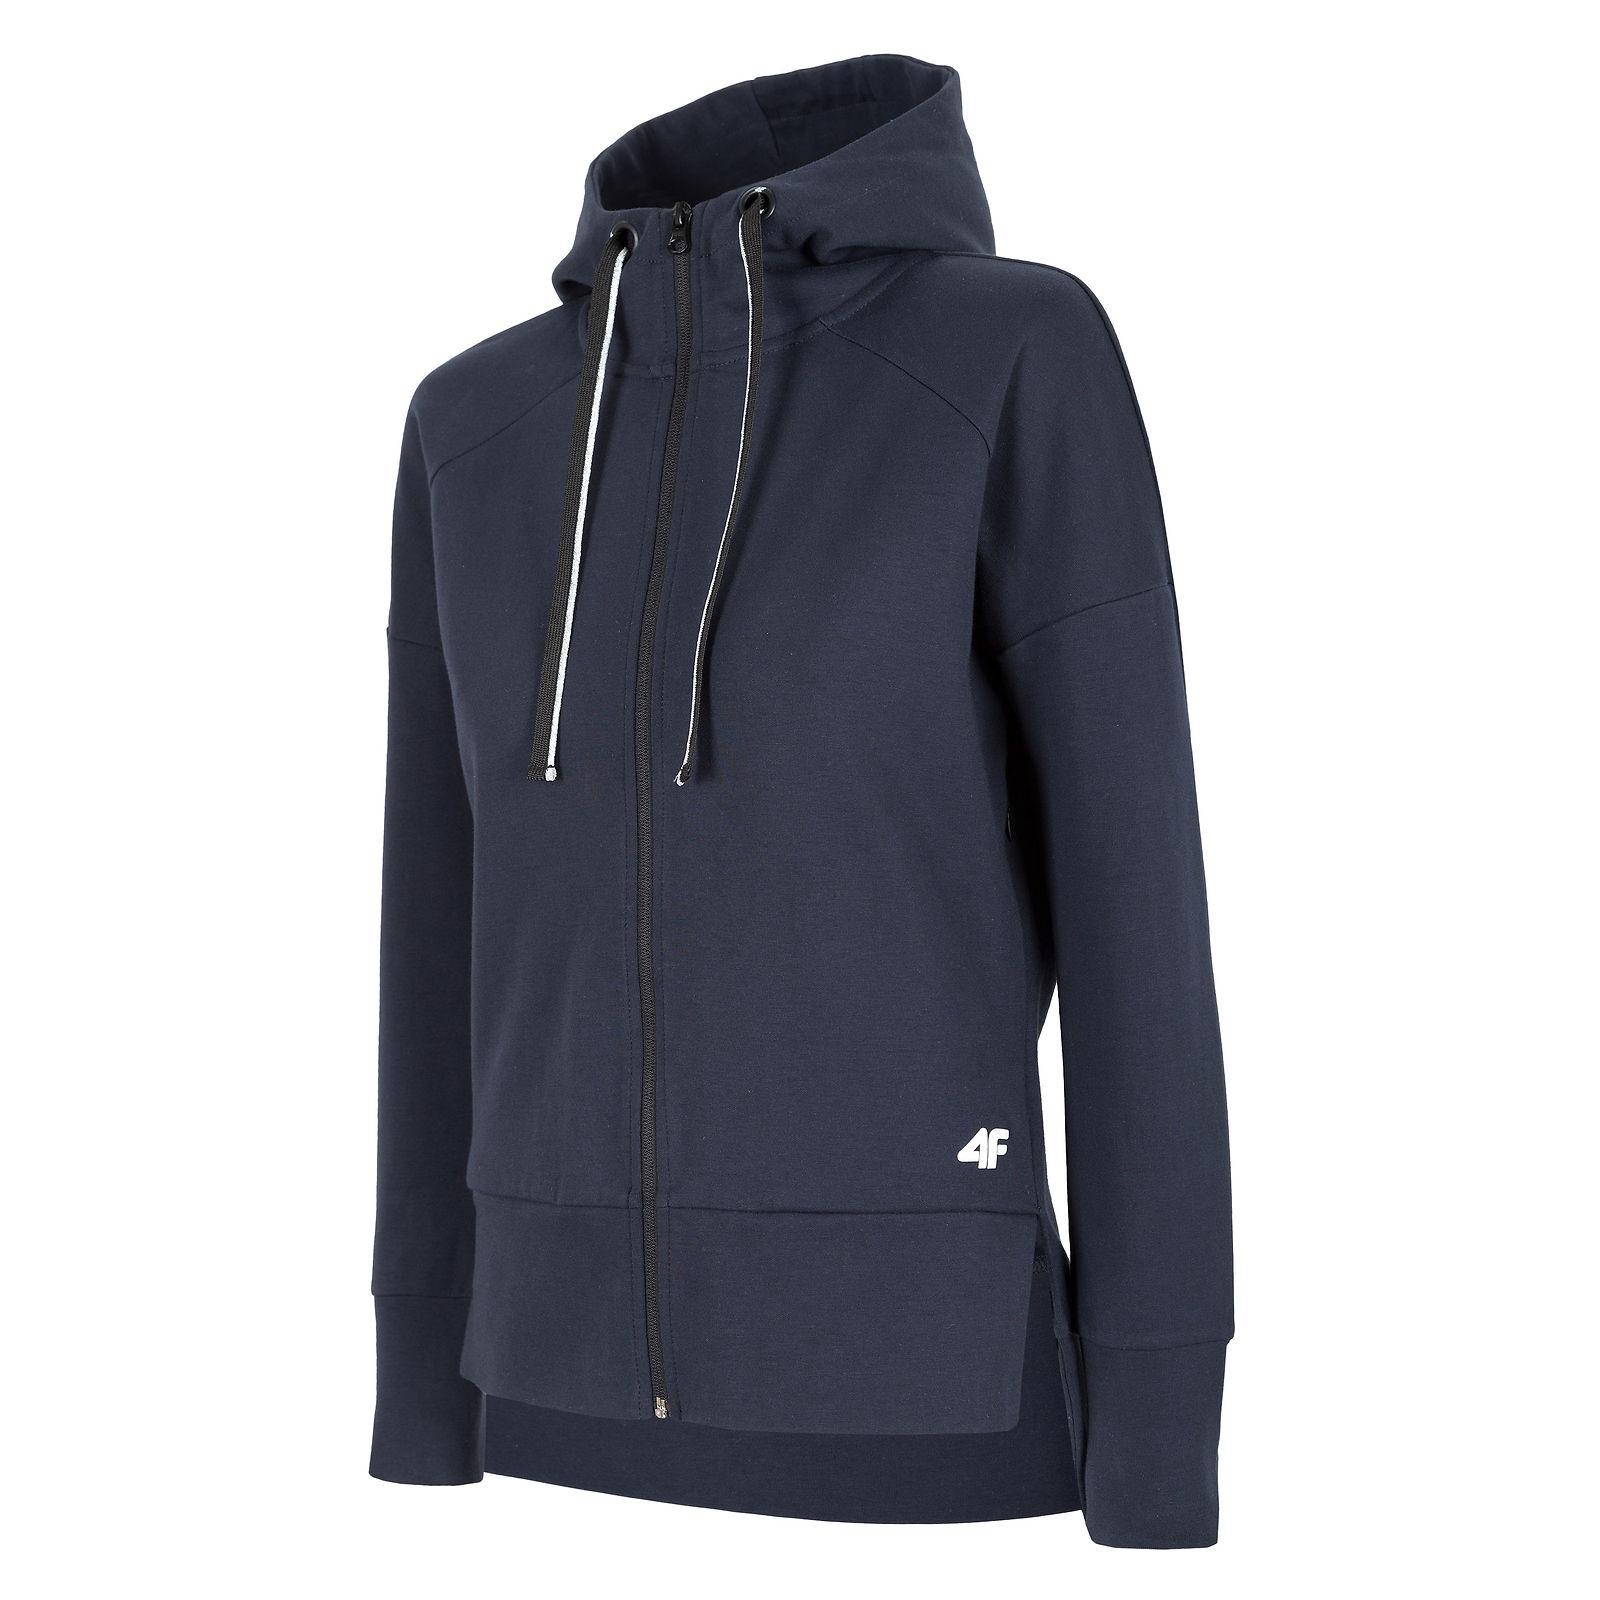 Bluza damska z kapturem 4F H4L20-BLD013